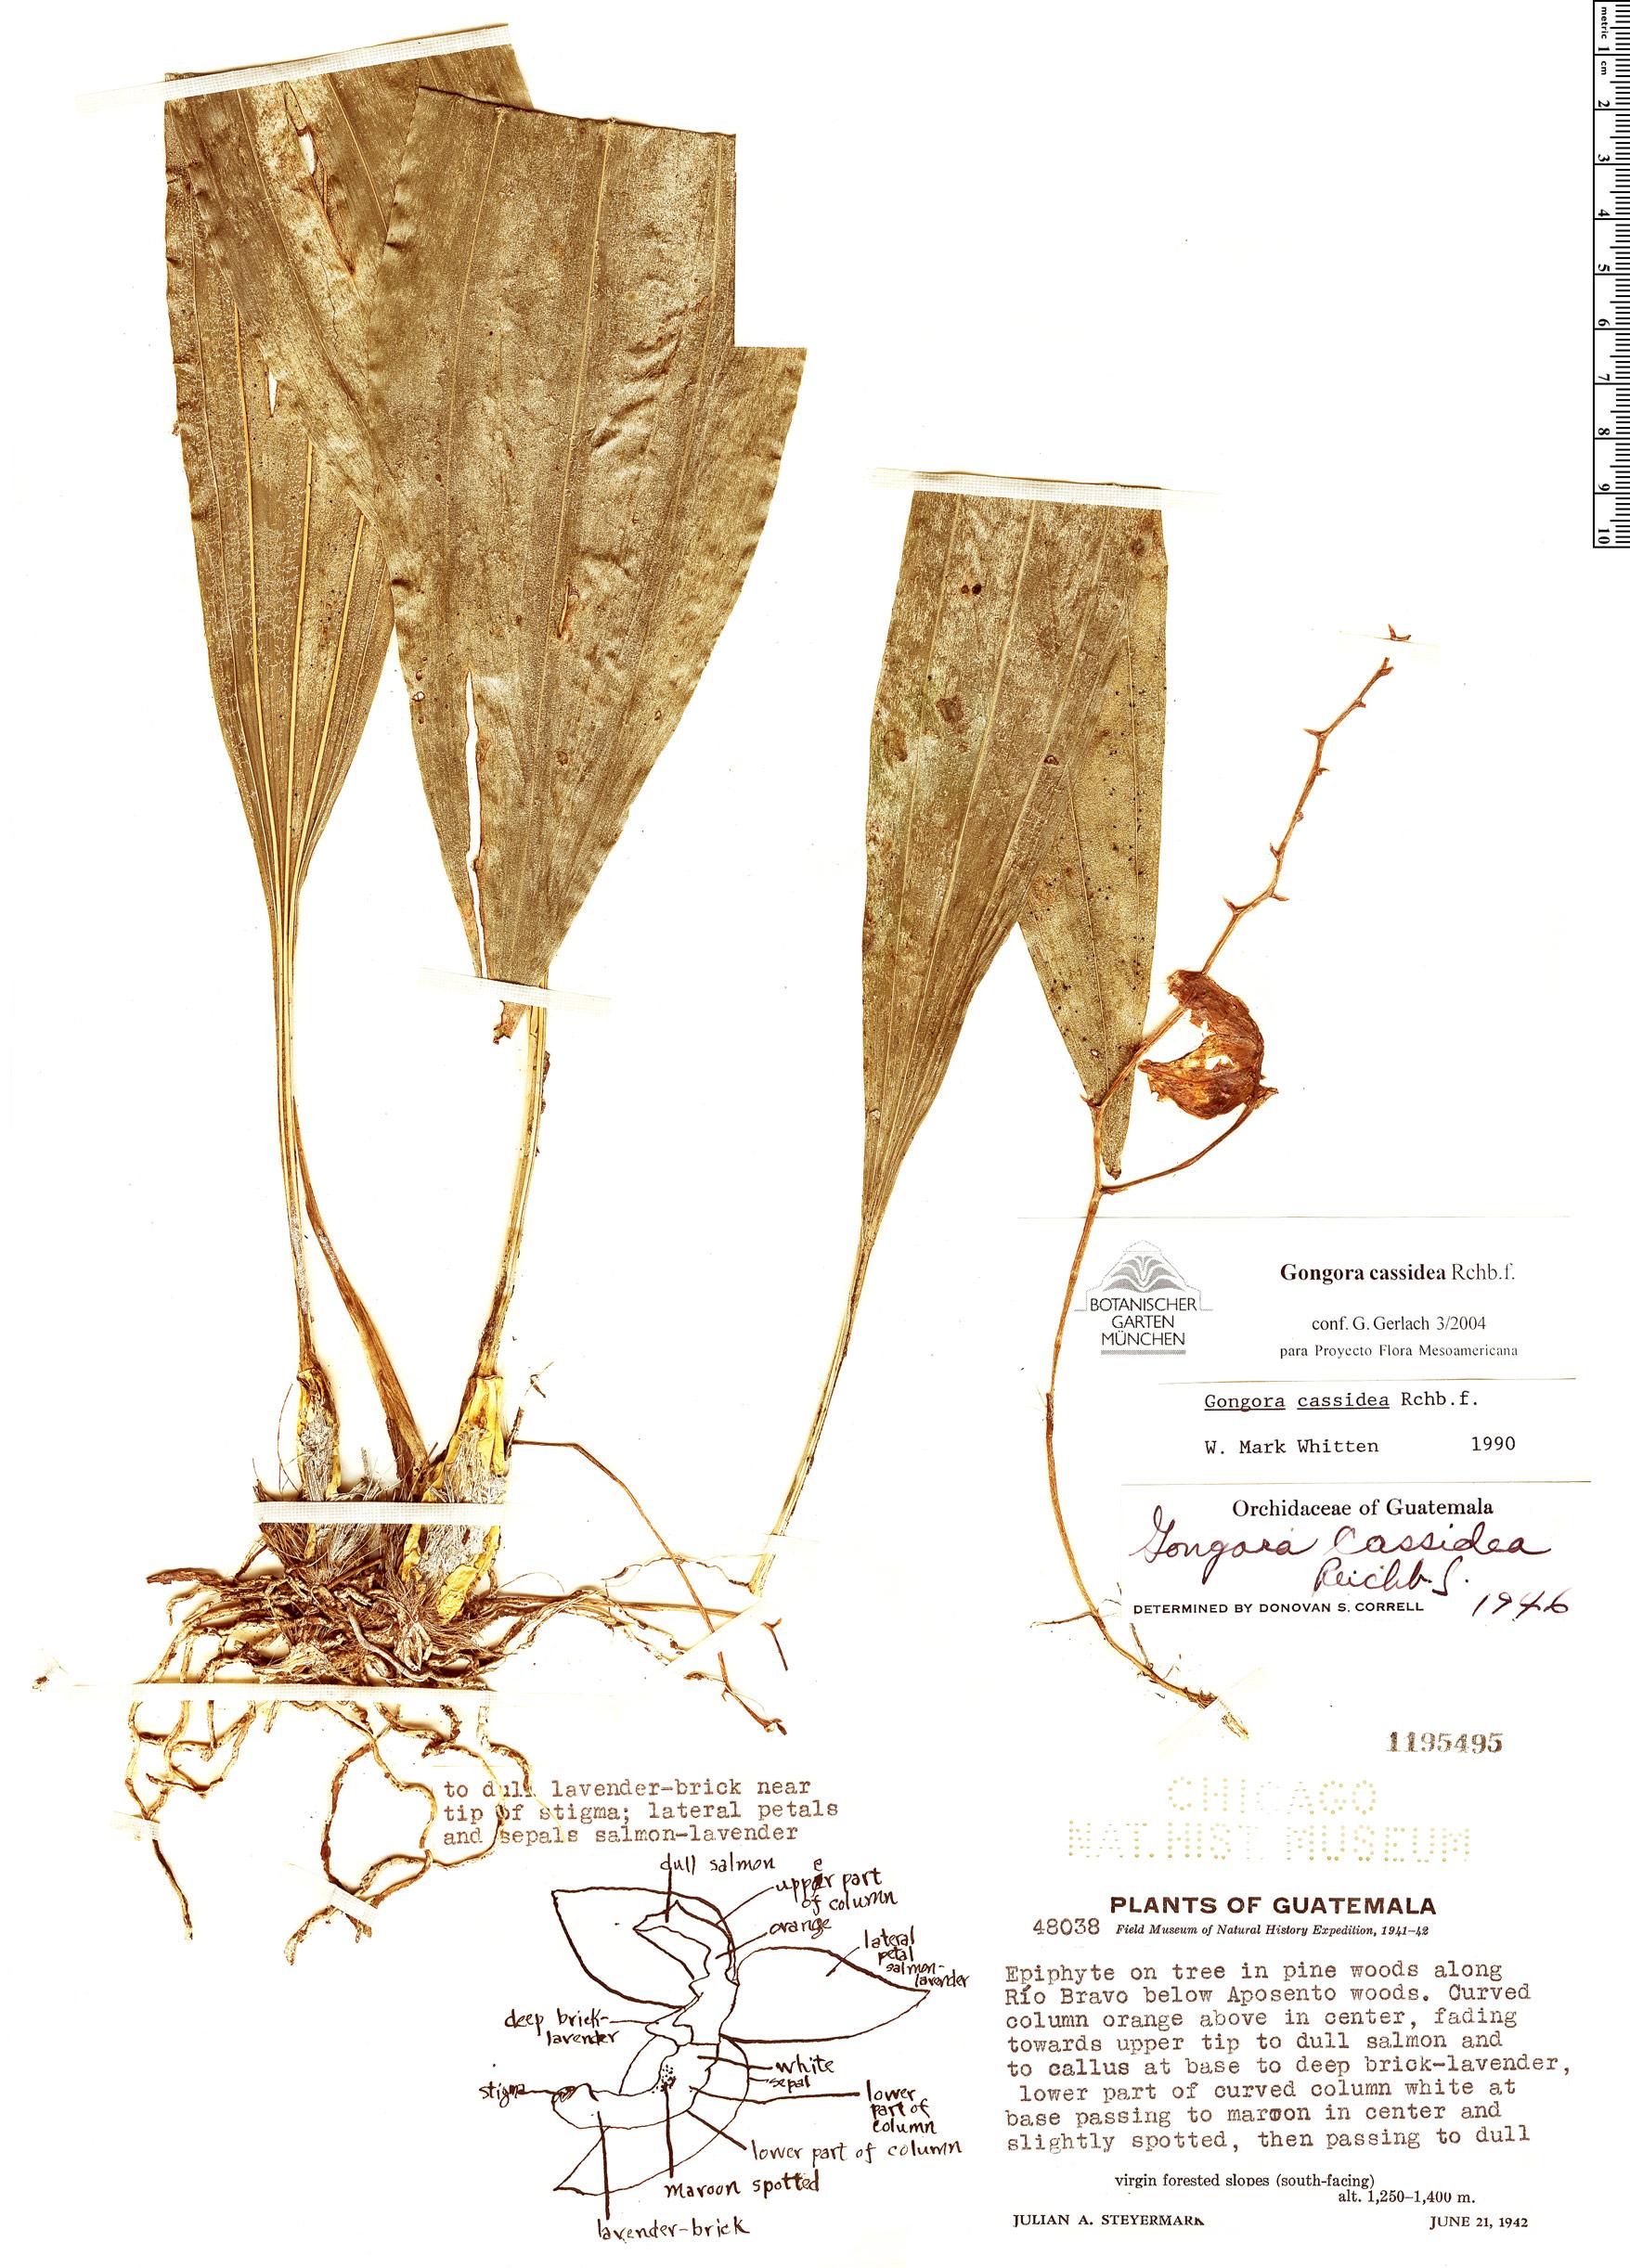 Specimen: Gongora cassidea